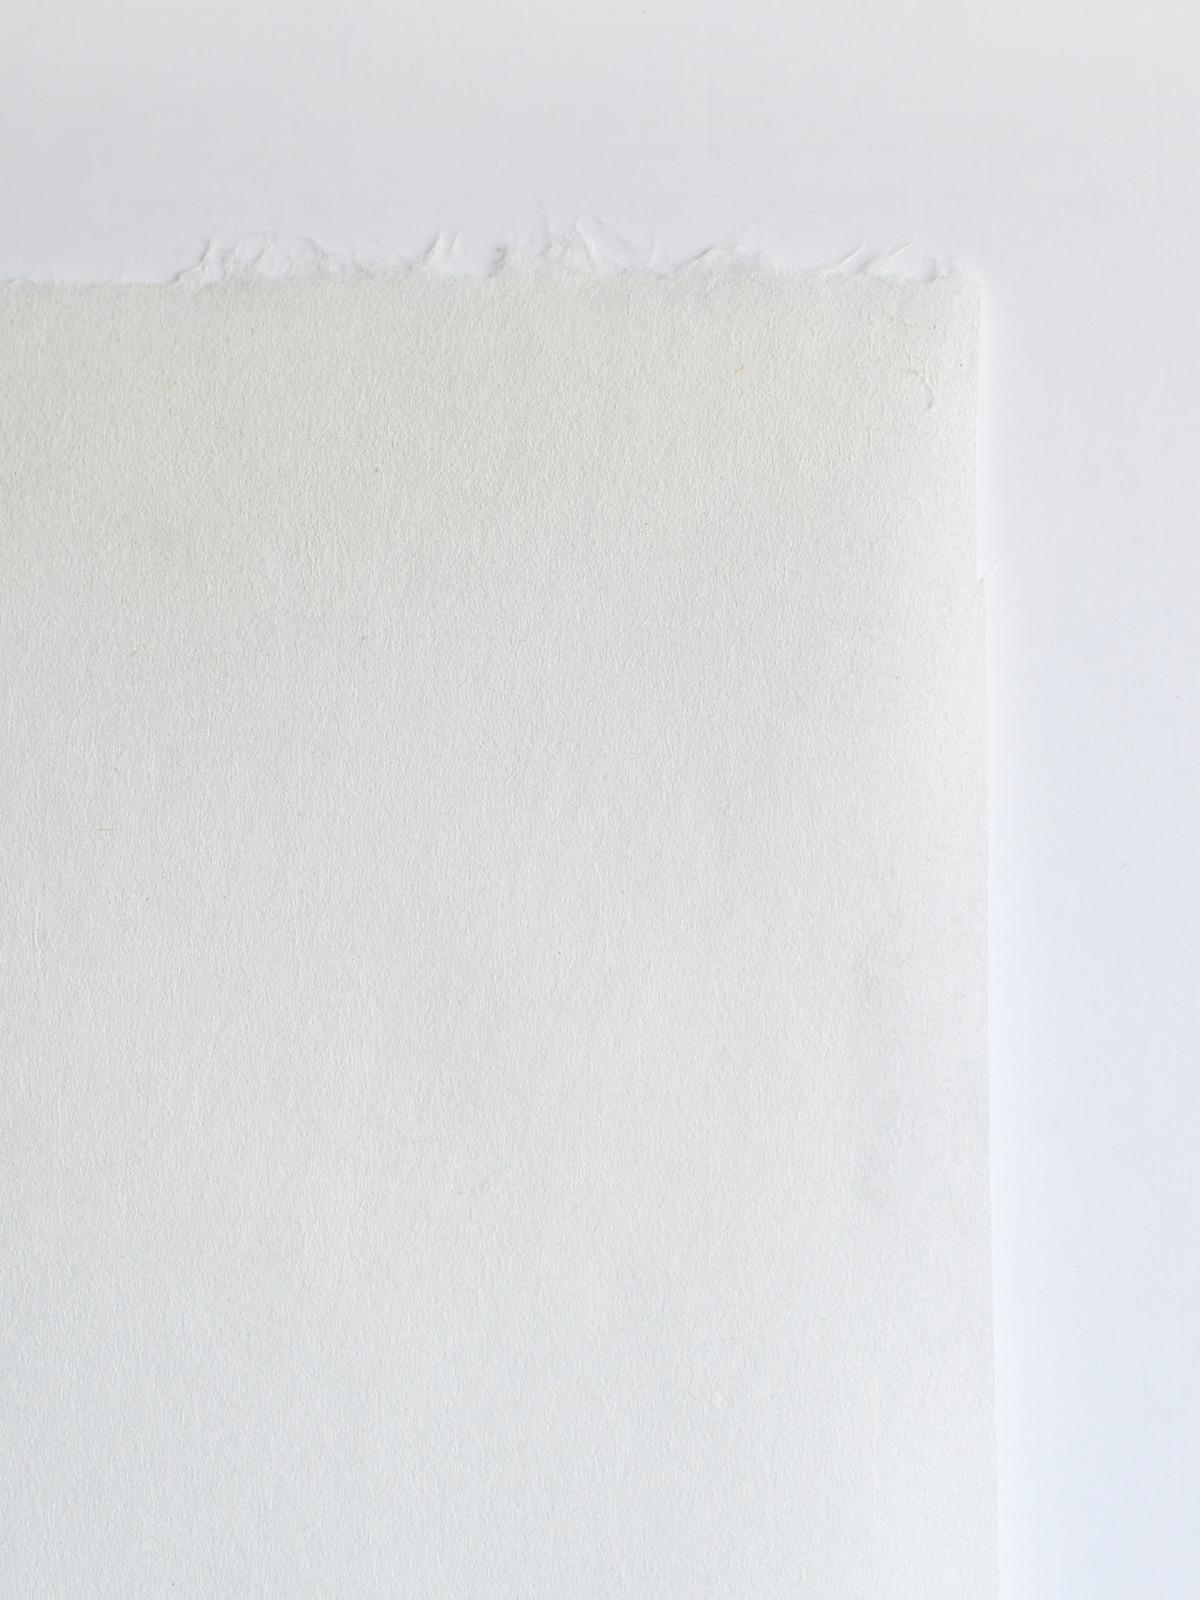 Okawara Student Grade Paper Sheets